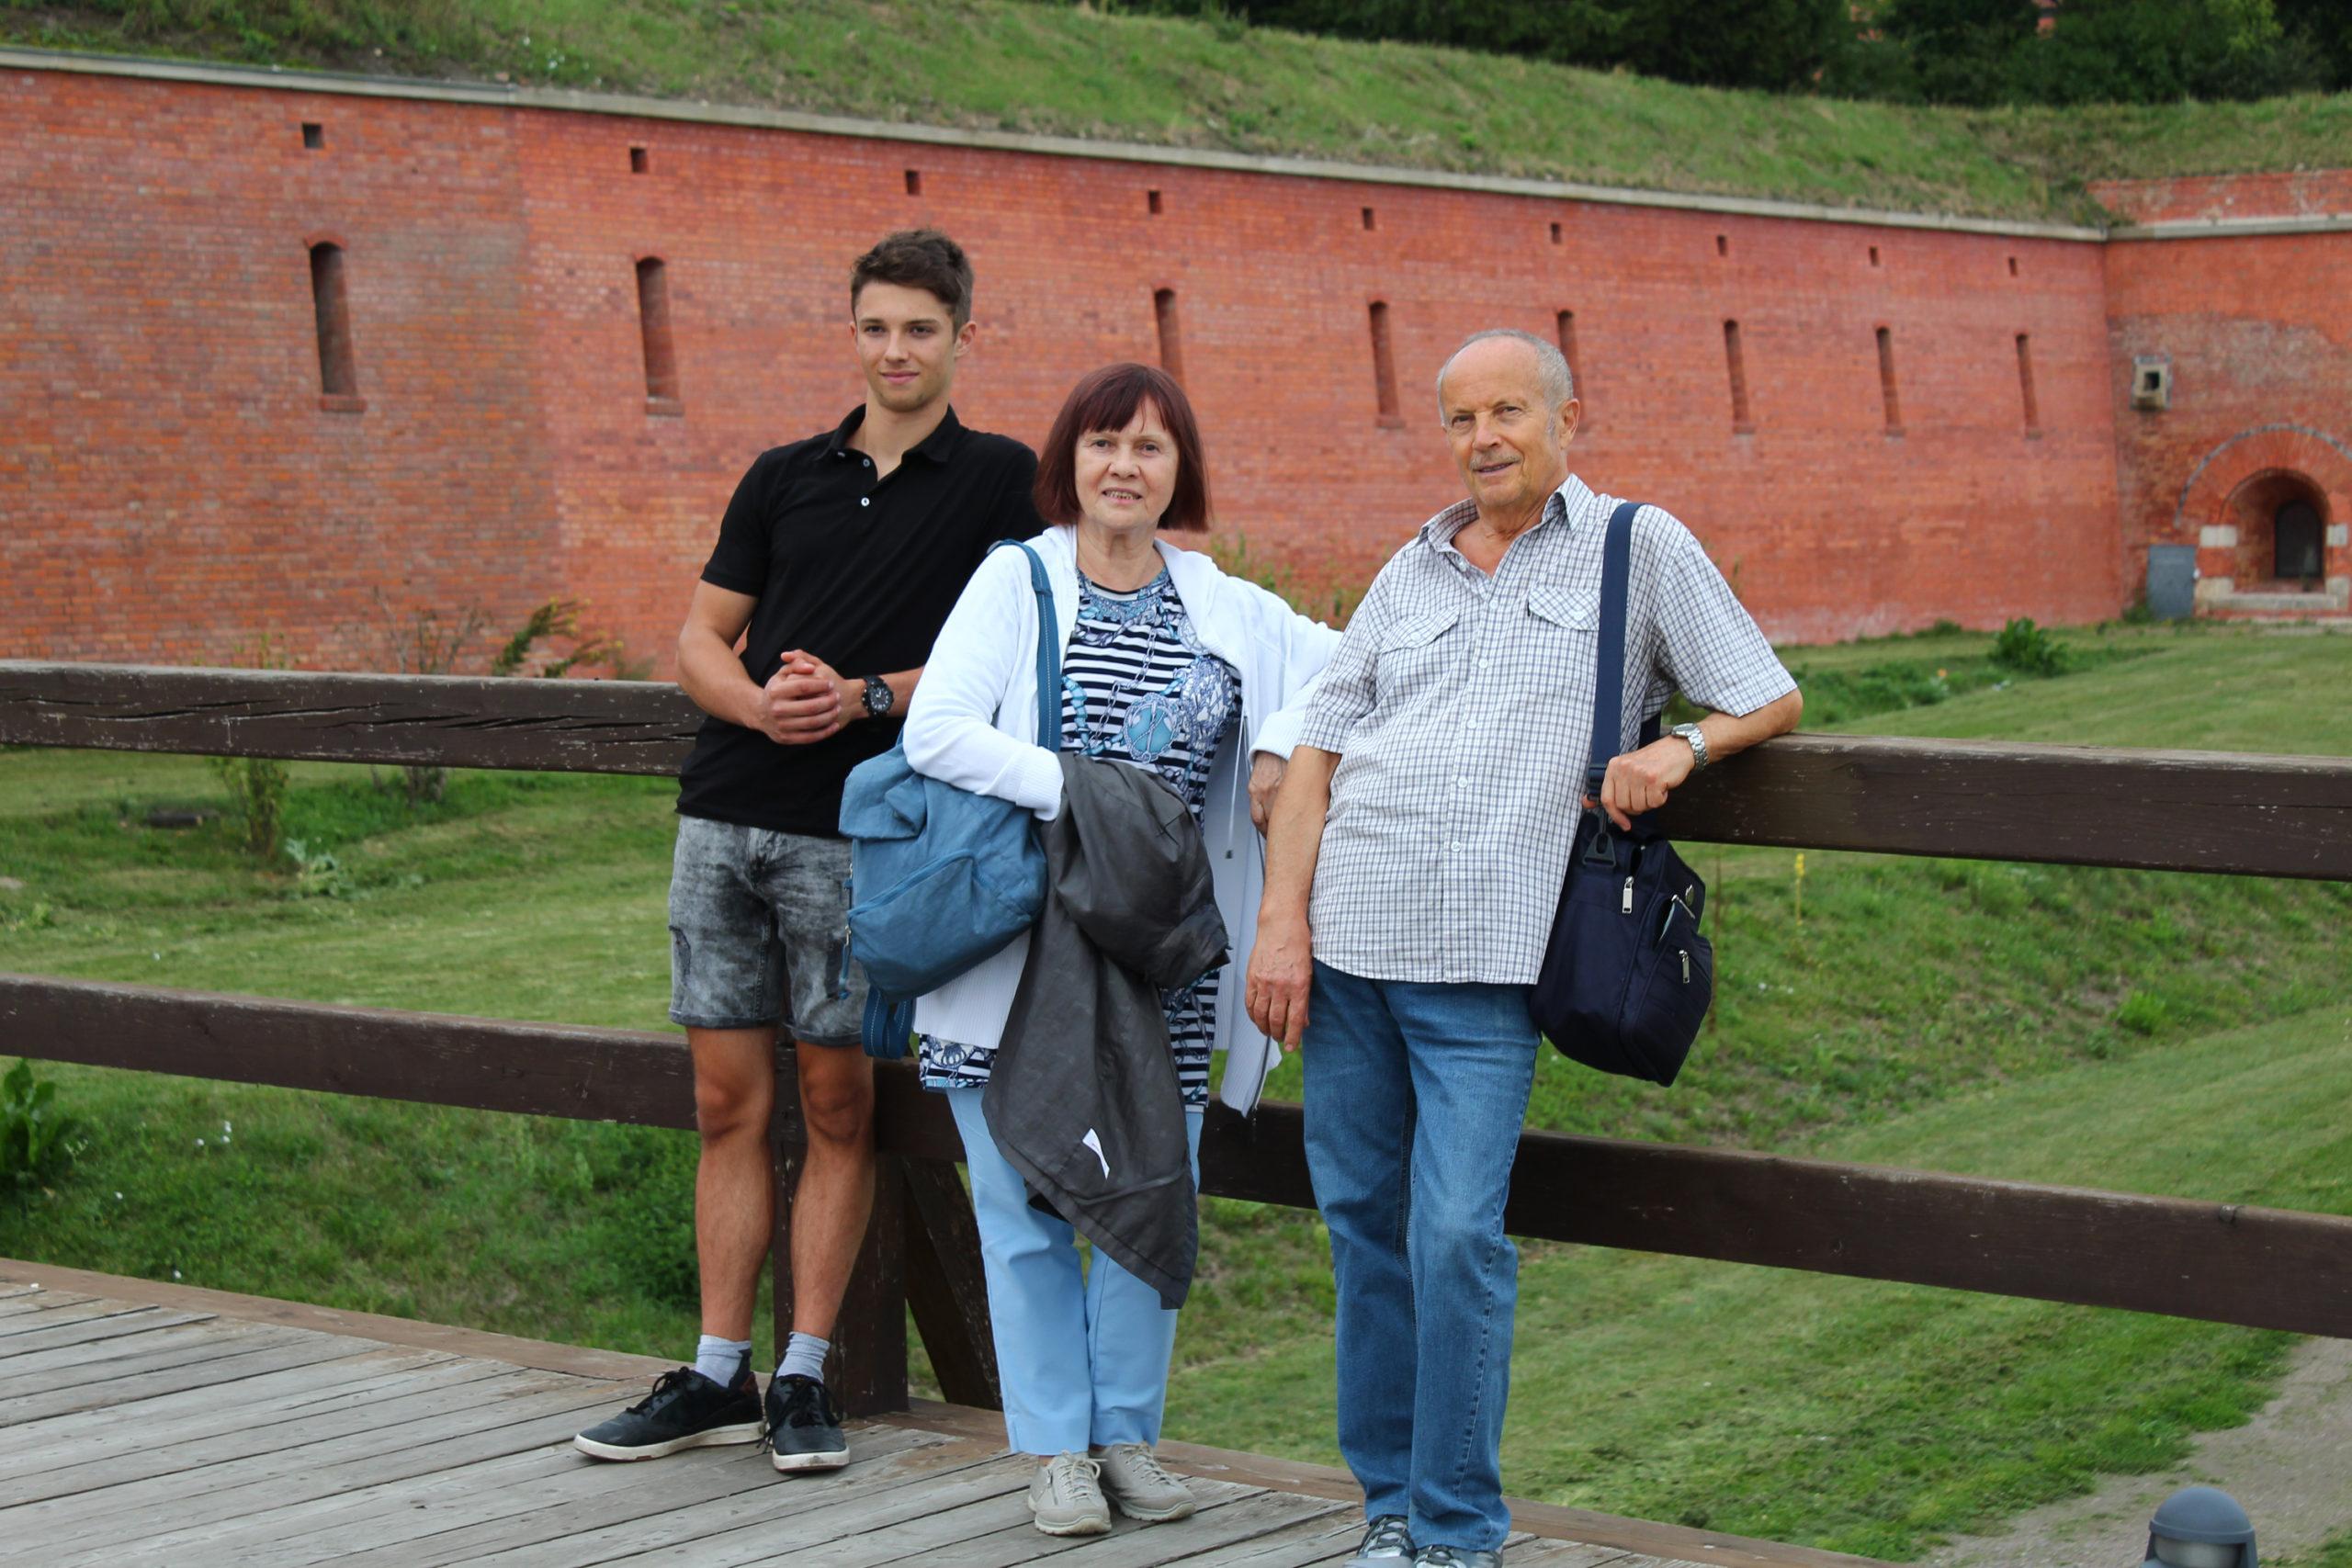 Rodzina na mostku